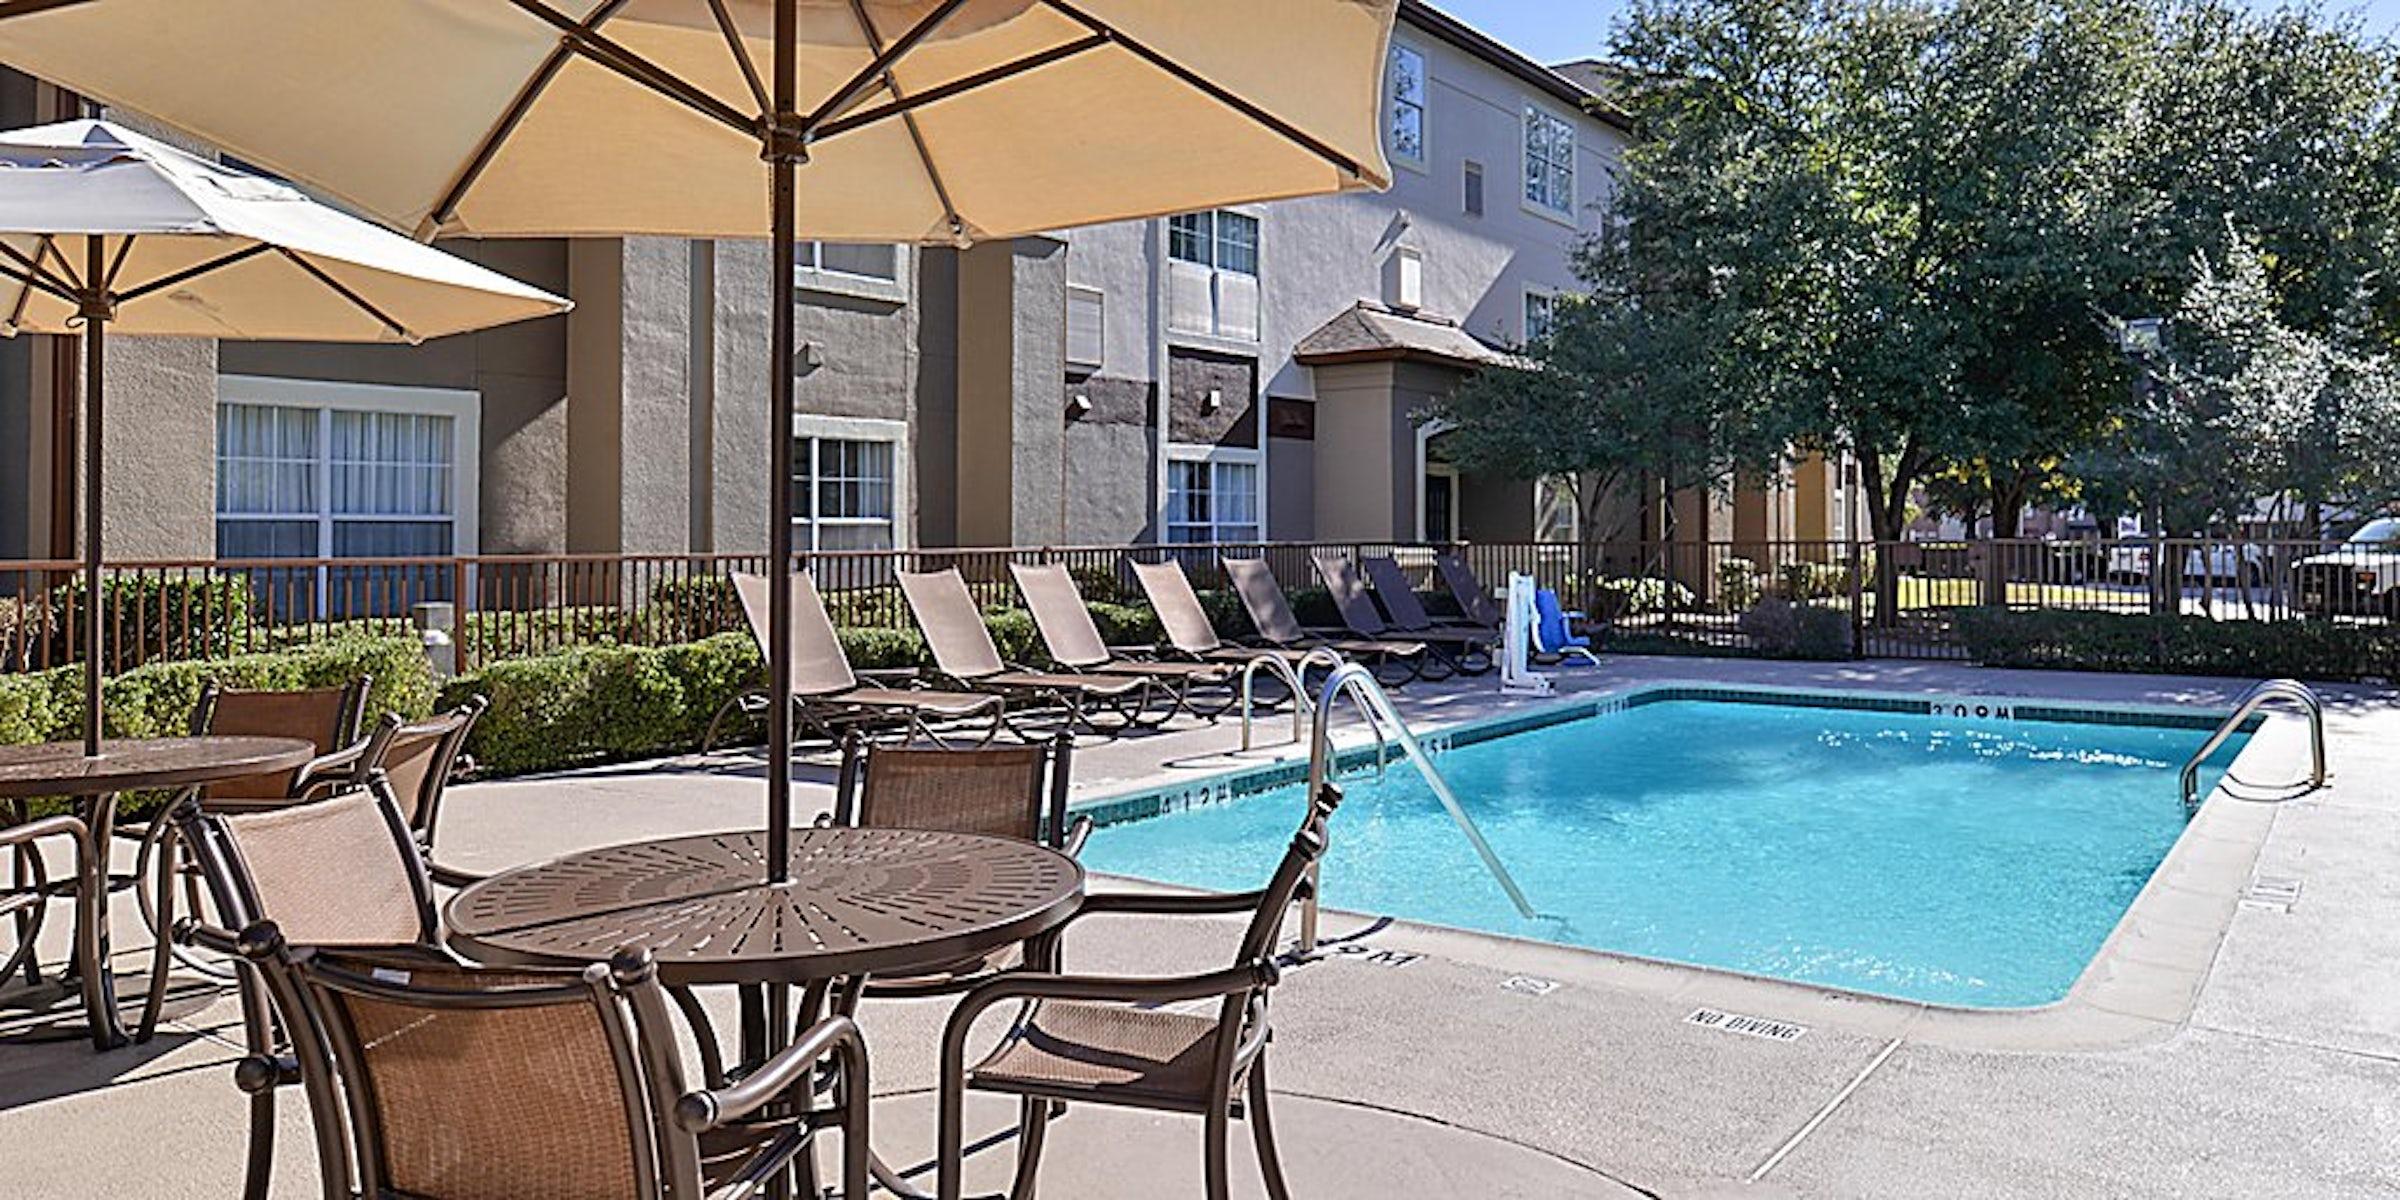 Staybridge Suites Dallas Addison in Beyond Dallas